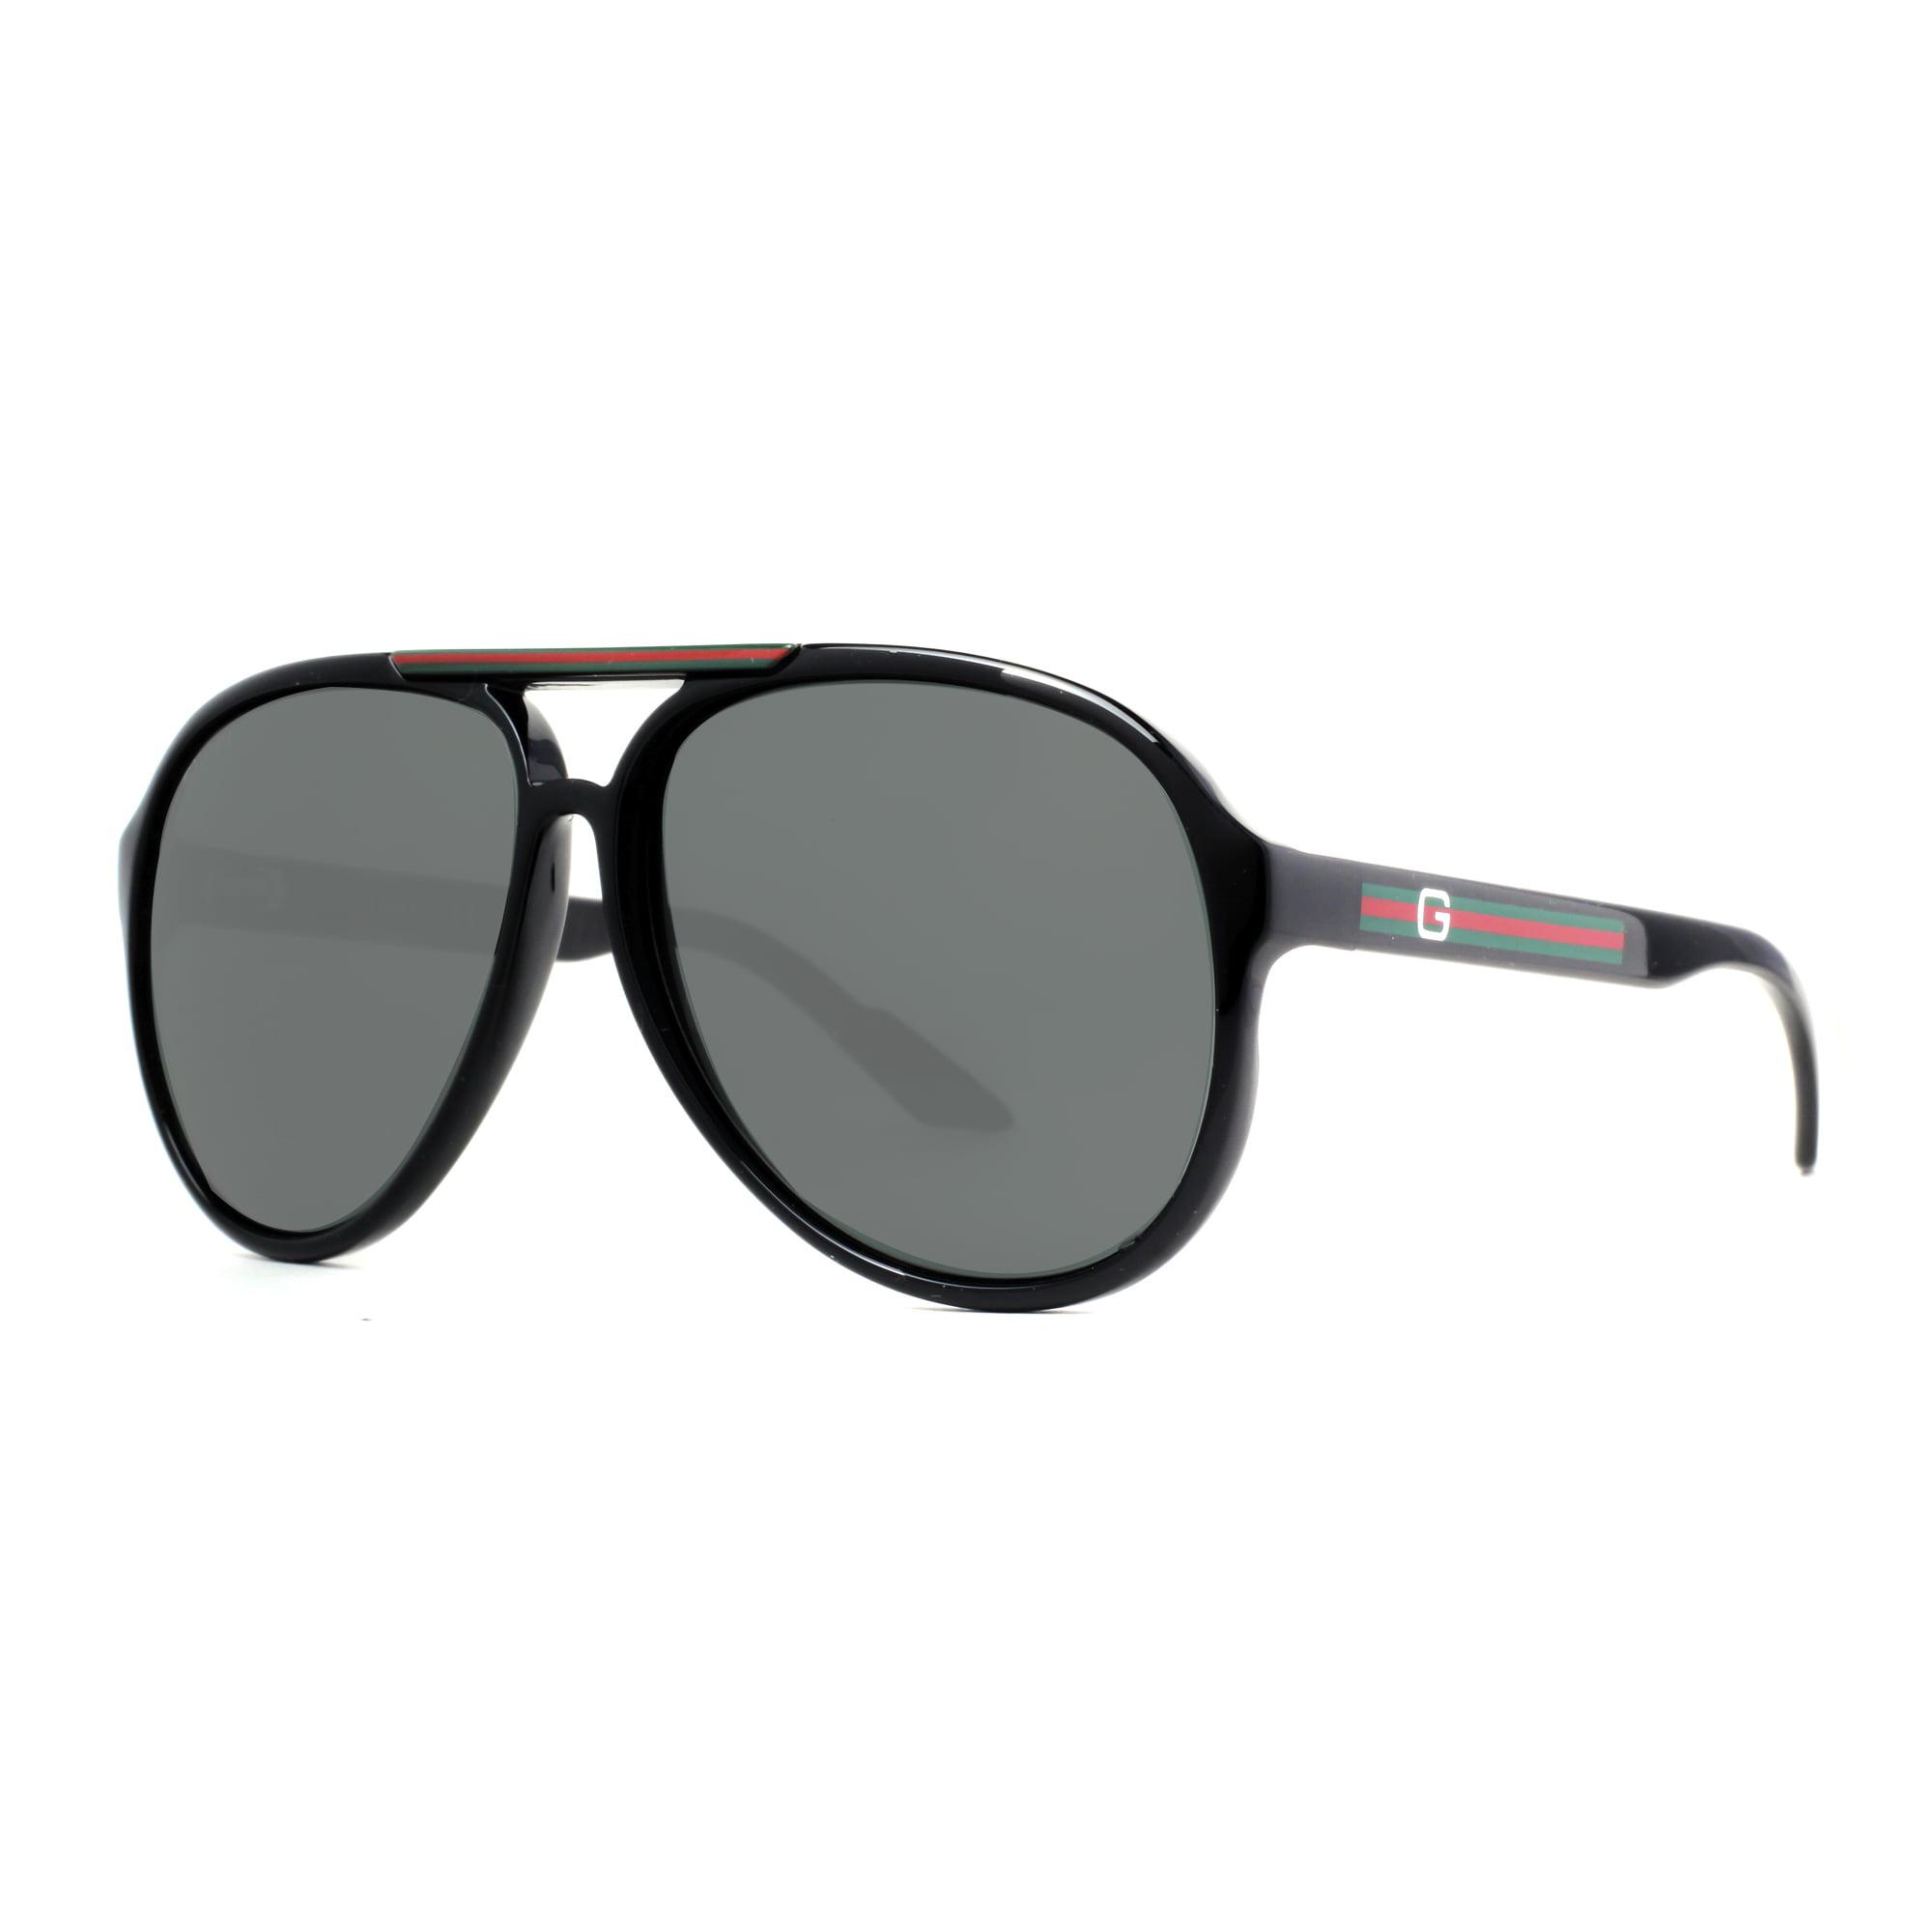 94ed1aba517de ... Havana Brown Black Rubber Men s Aviator Sunglasses. Gucci GG 1627 S  D28 R6 Shiny Black Grey Aviator Sunglasses